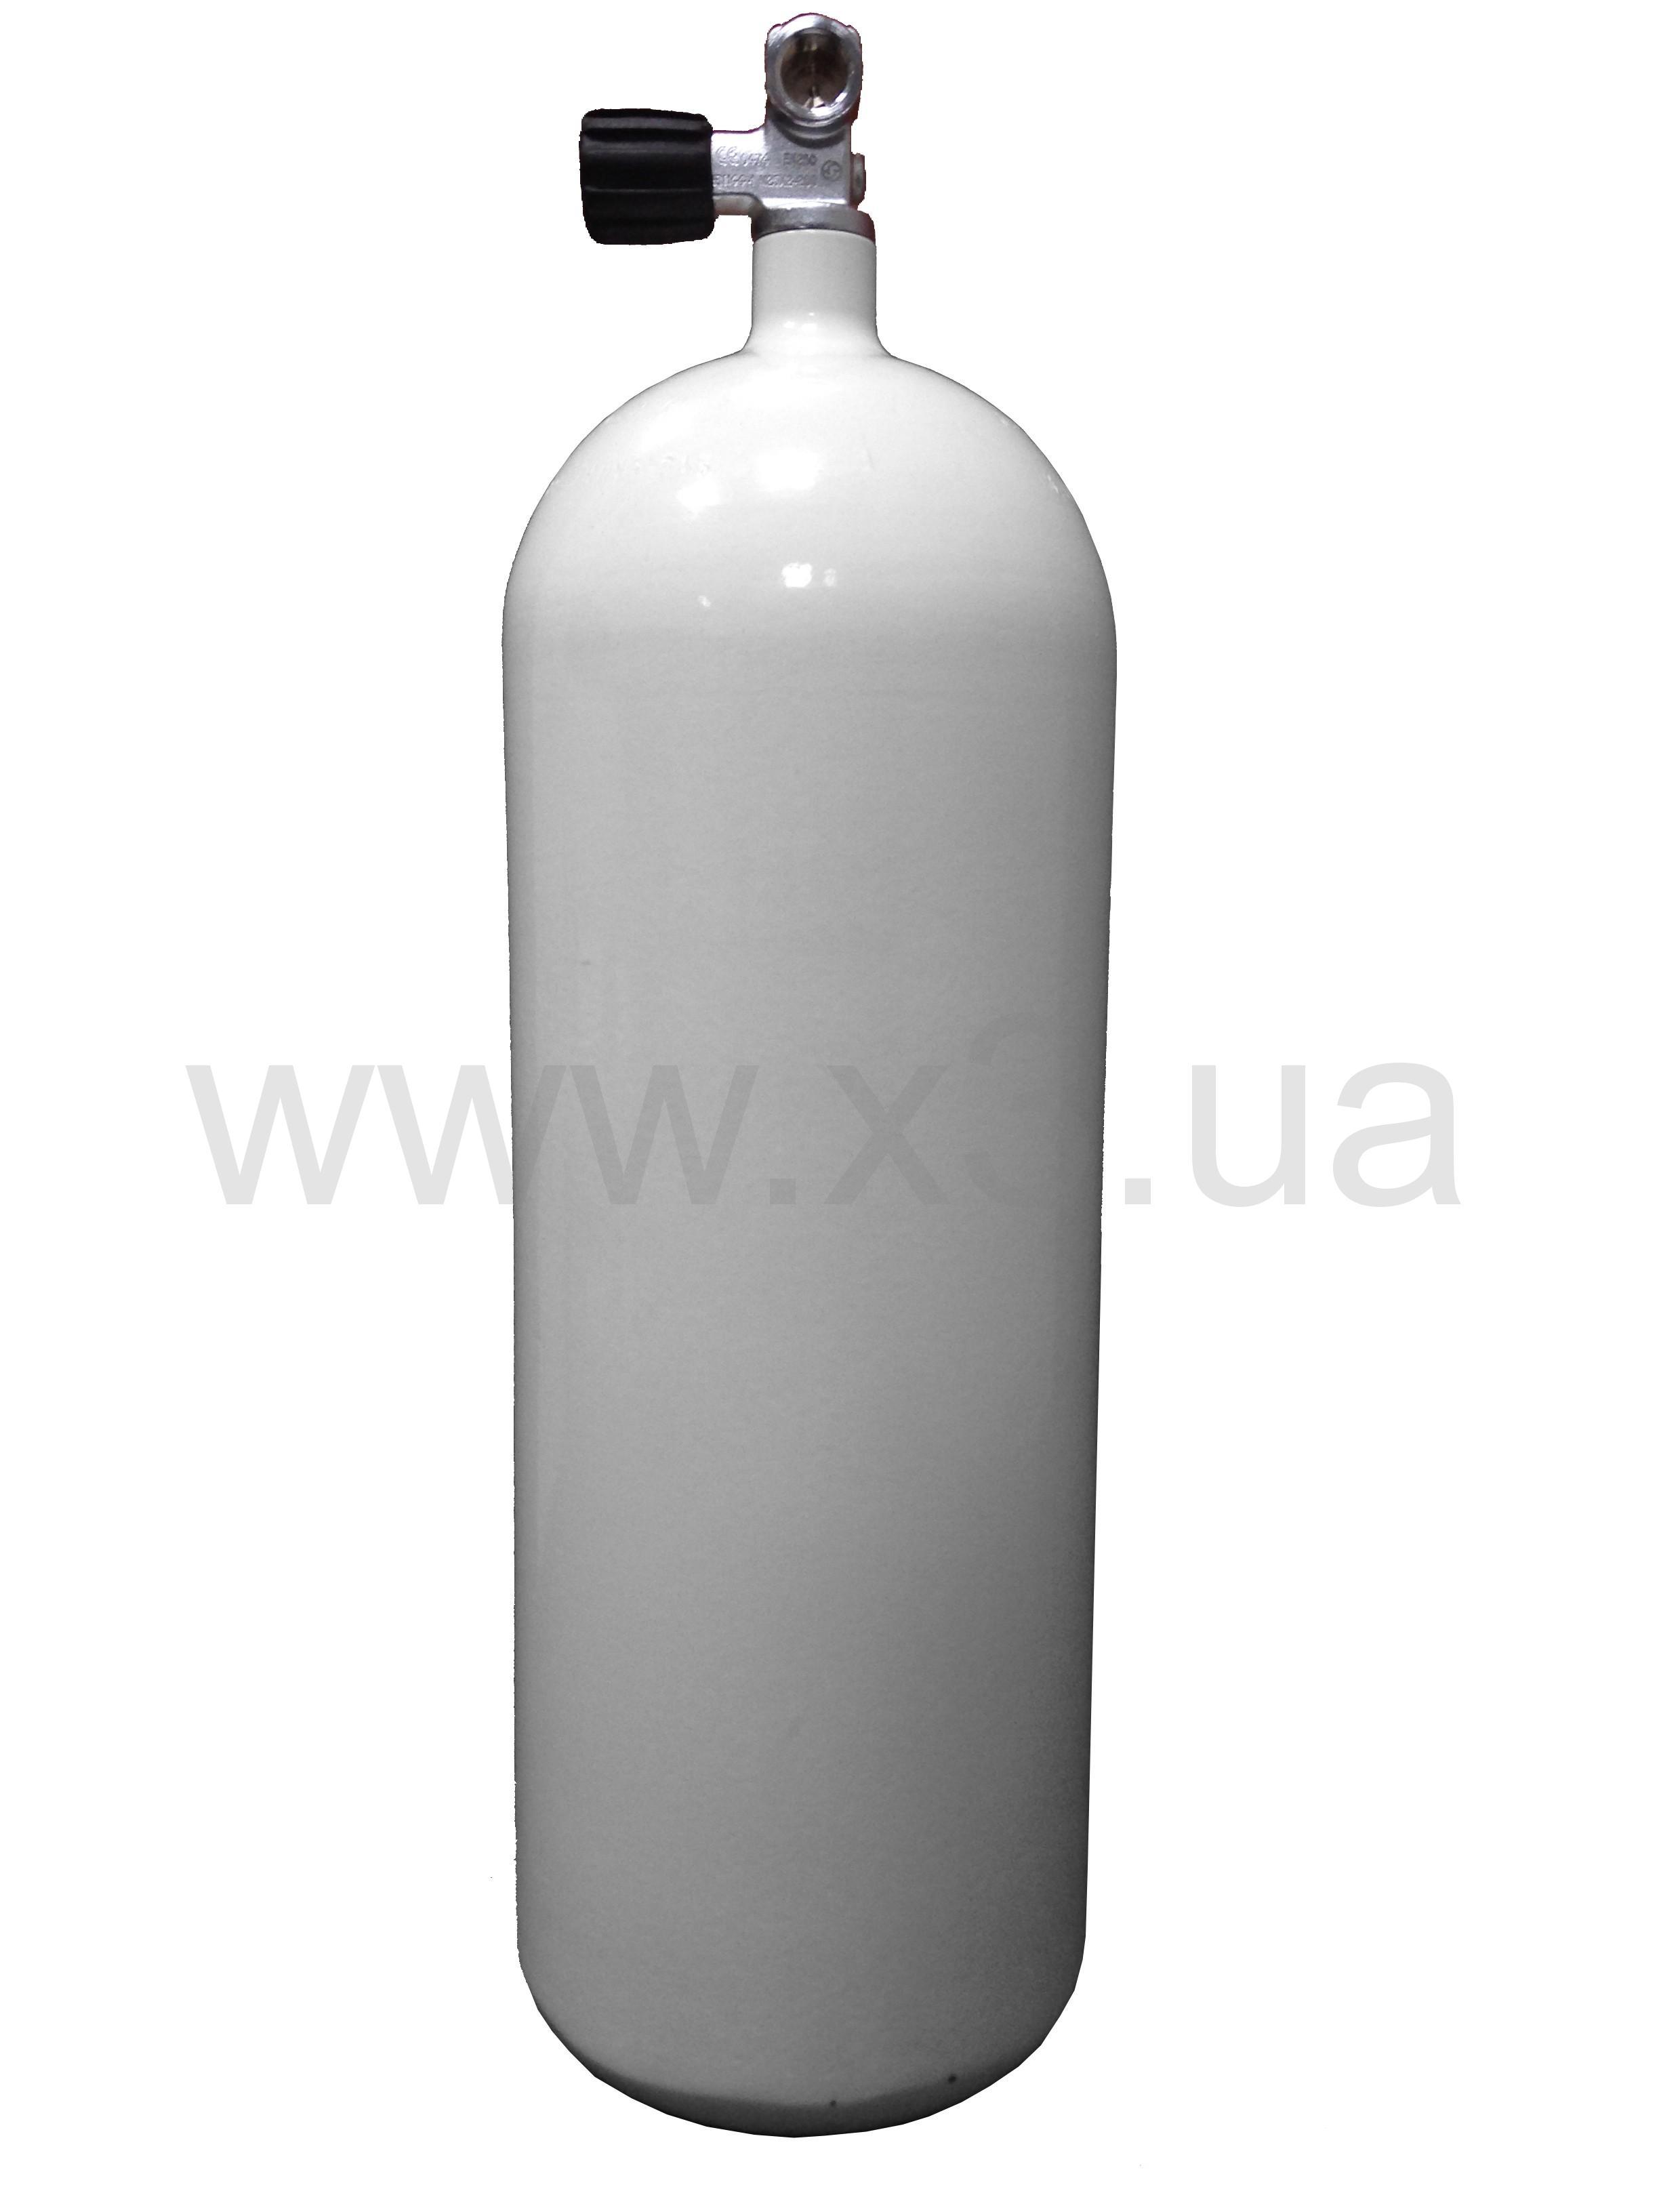 deepzone Баллон (акваланг)DEEPZONE баллон стальной 16 л, 230 Bar, 171 мм с вентилем CONCAVE